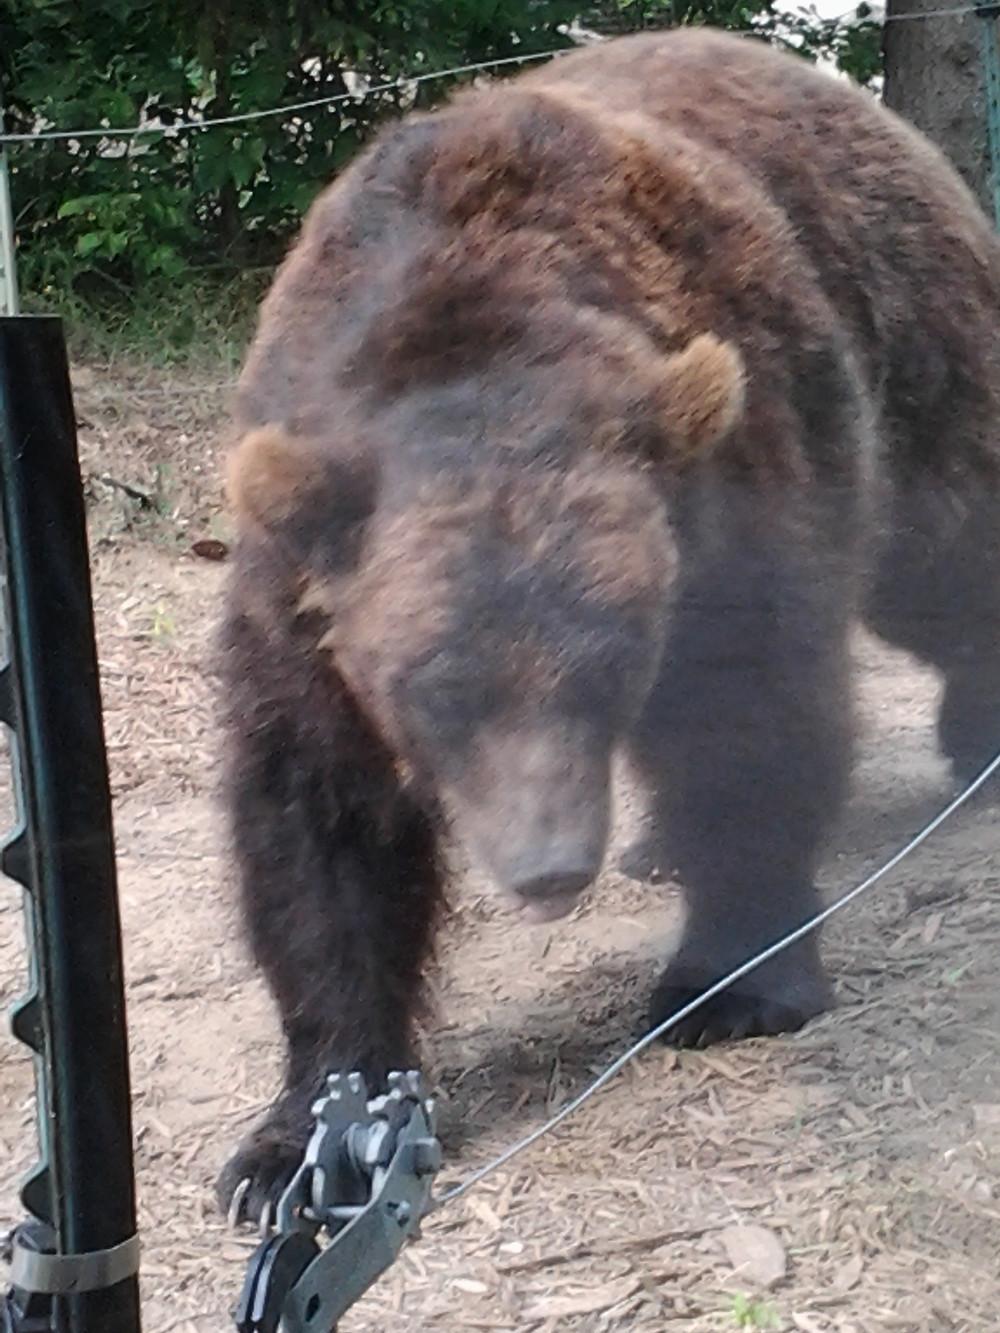 4 Zoo - Grizzly bear.jpg